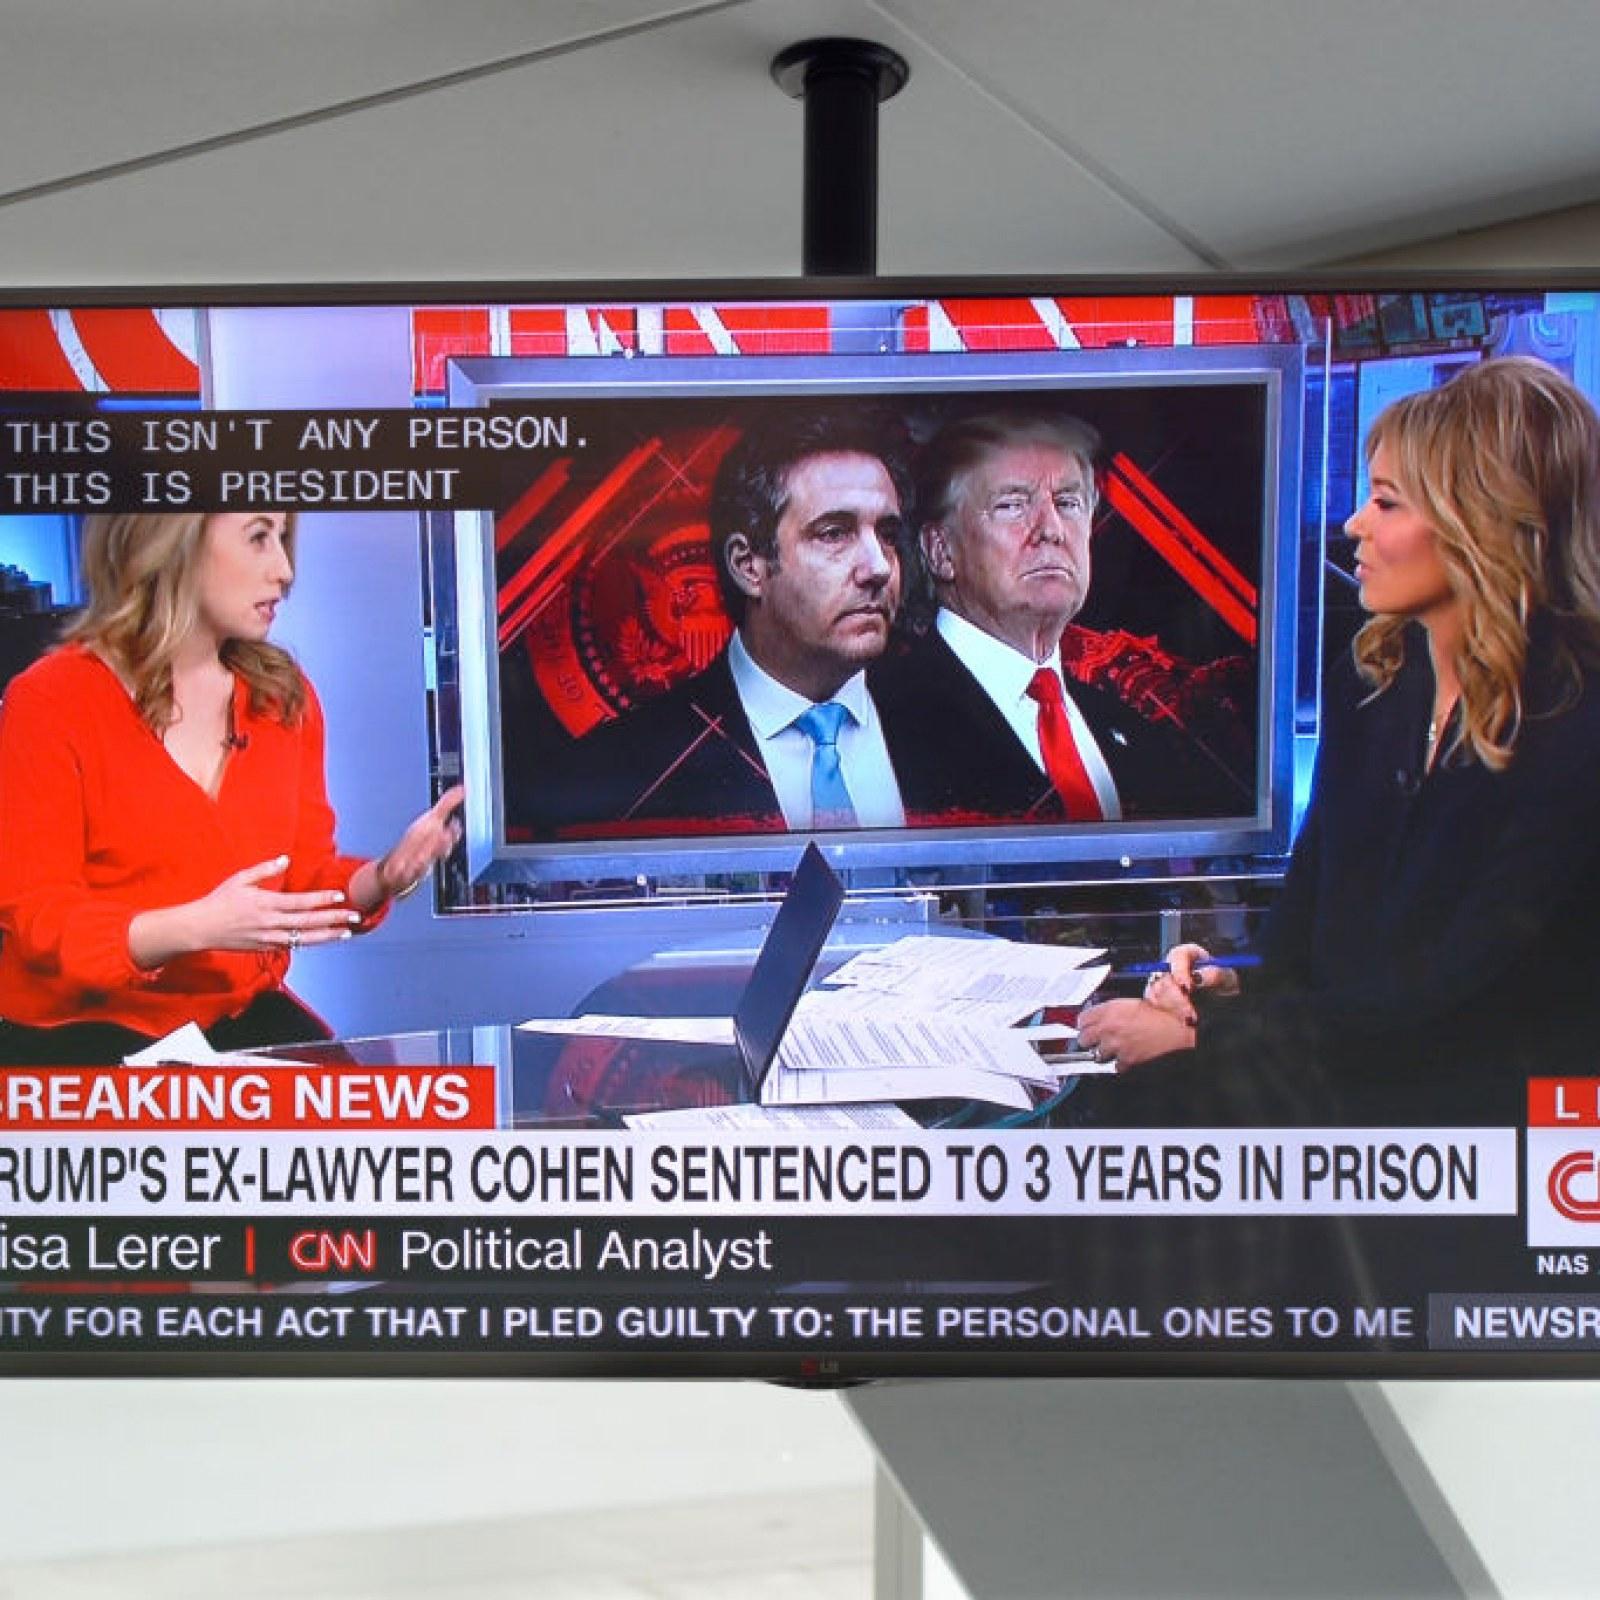 Fox News Host Complains MSNBC, CNN Are All 'Opinion Shows